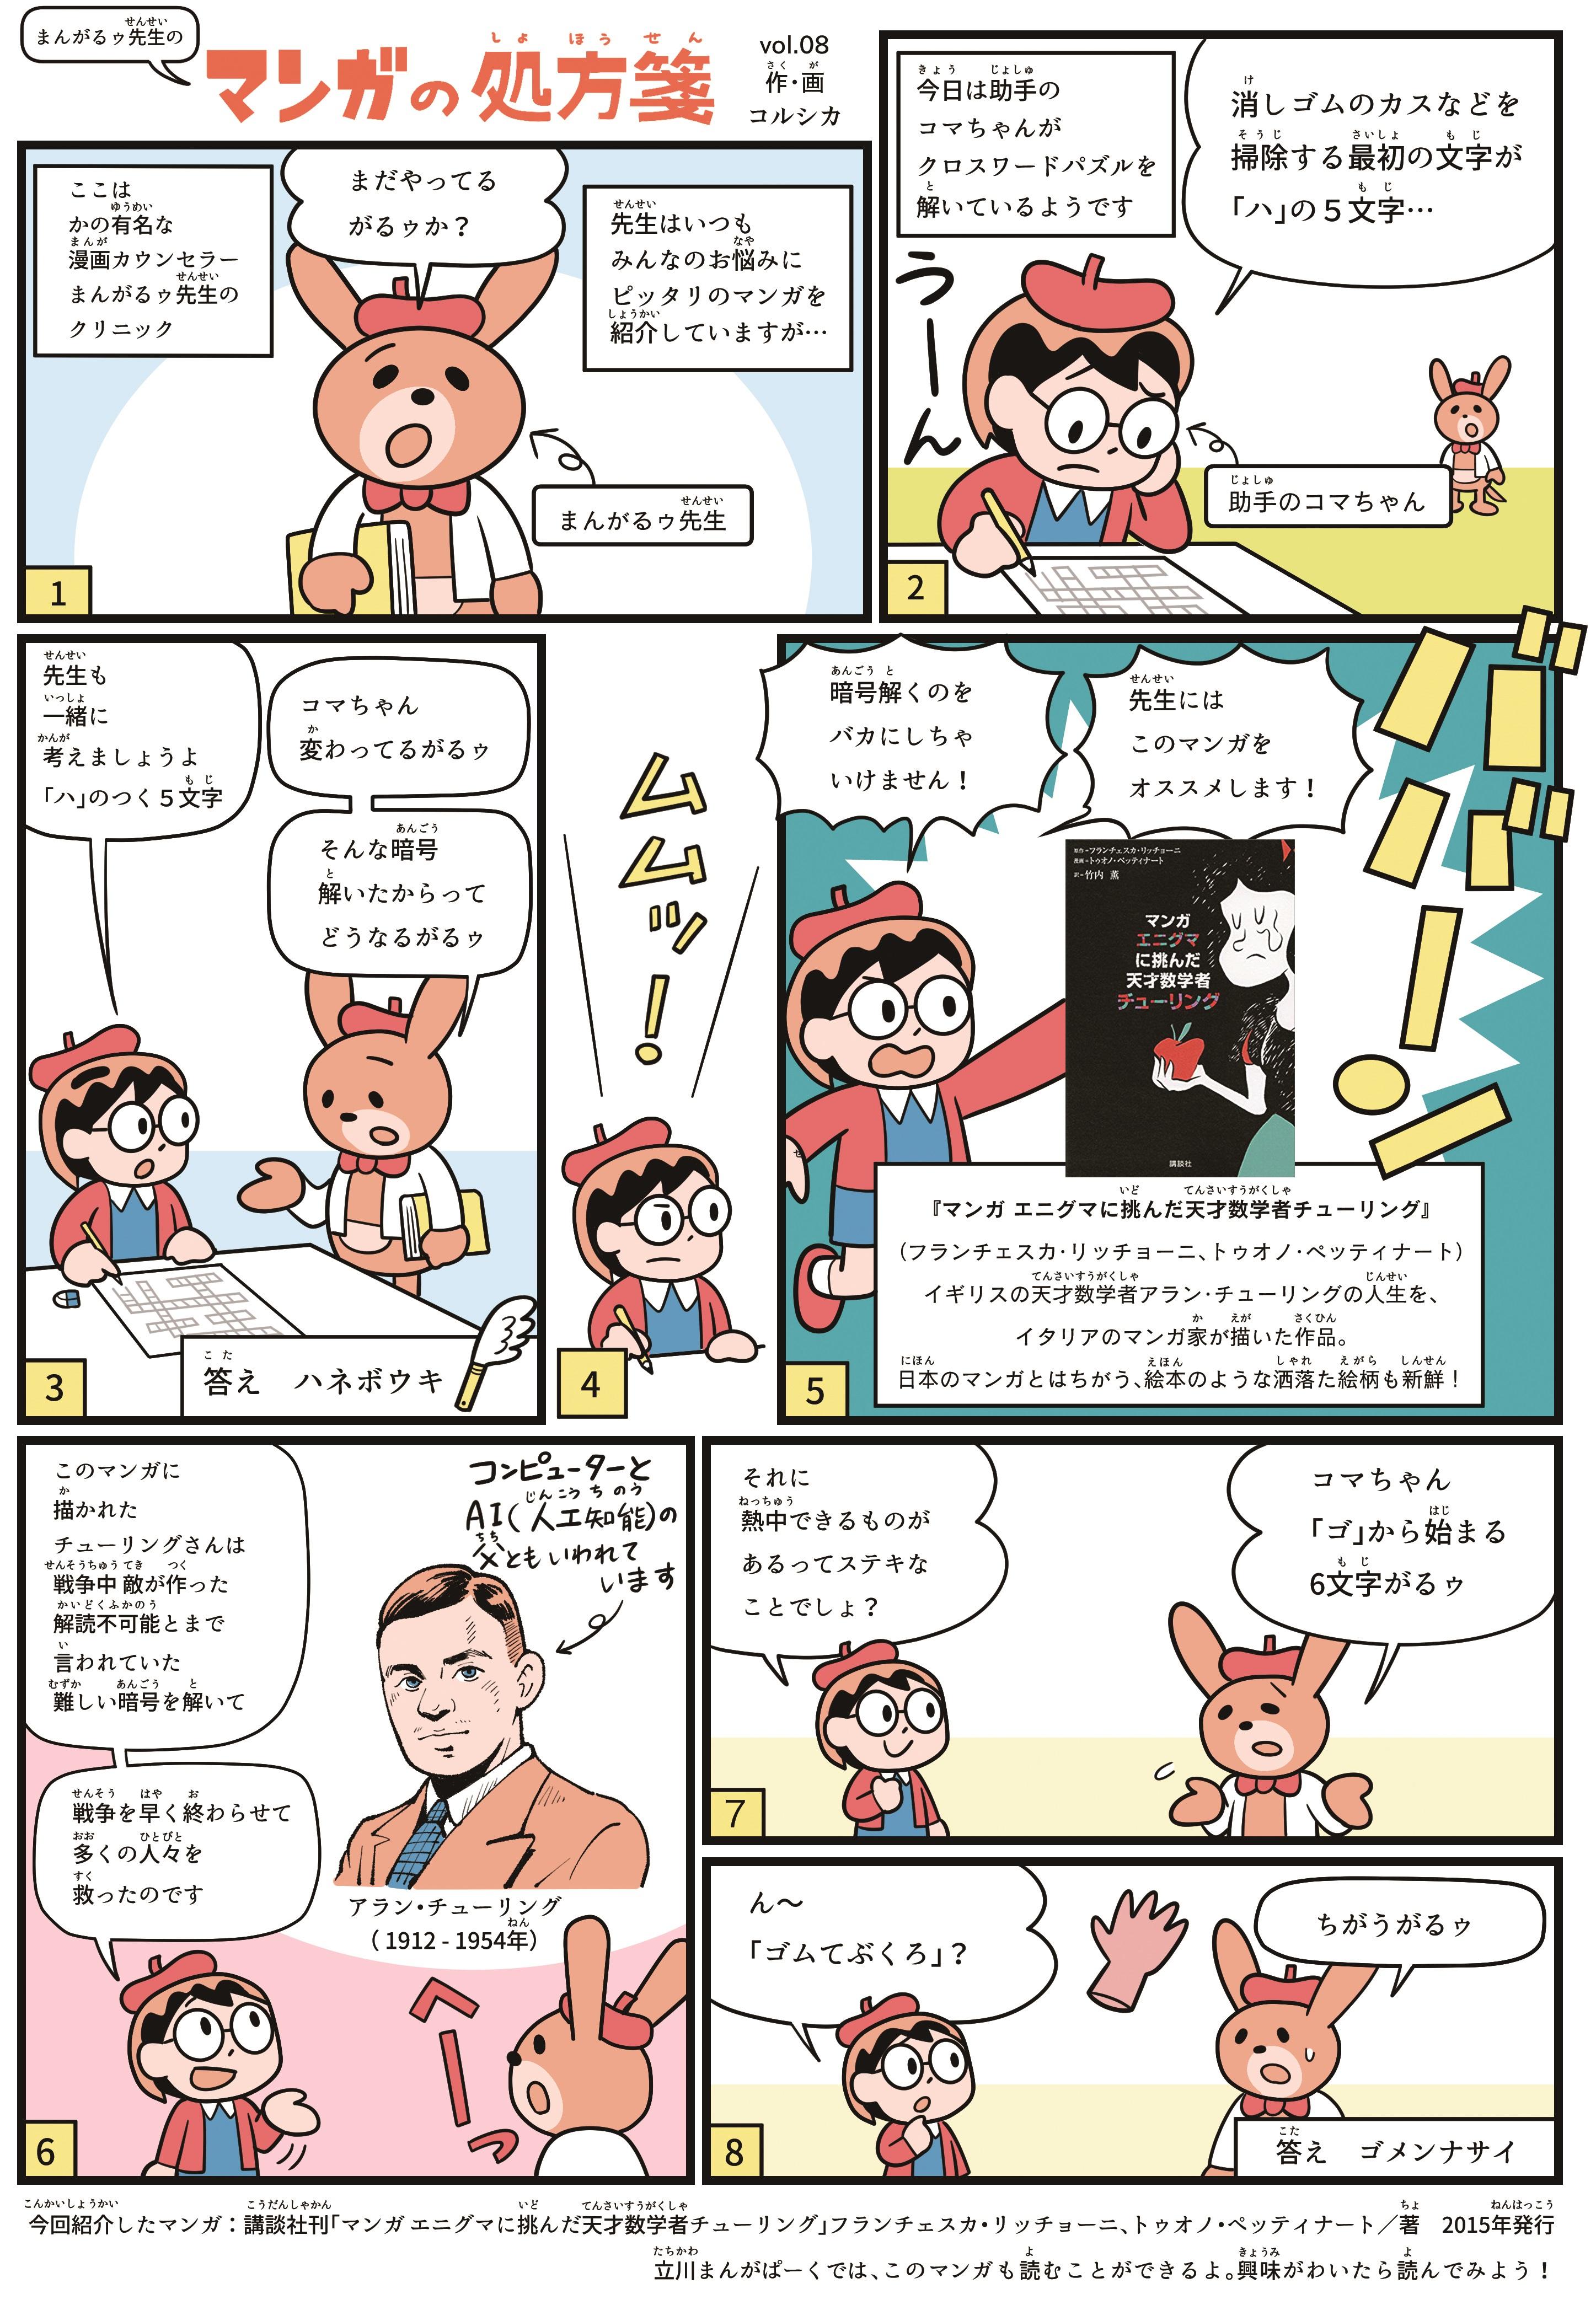 https://mangapark.jp/topics/2019/02/25/images/mangaroosensei_vol08.jpg